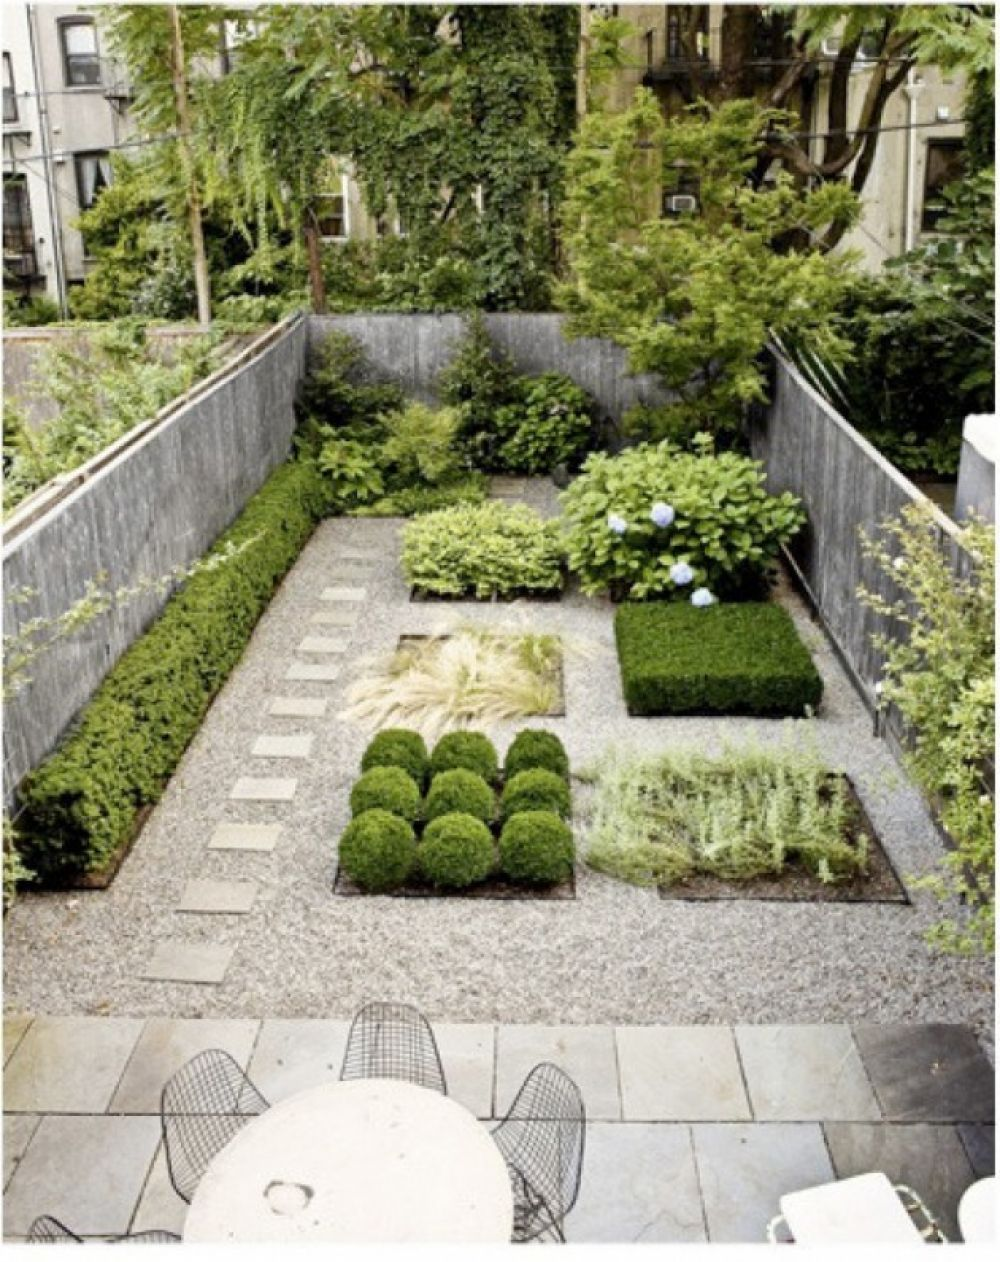 30 Wonderful Modern Rock Garden Ideas To Make Your Backyard Beautiful In 2020 Small Garden Design Japanese Garden Design Small Backyard Landscaping